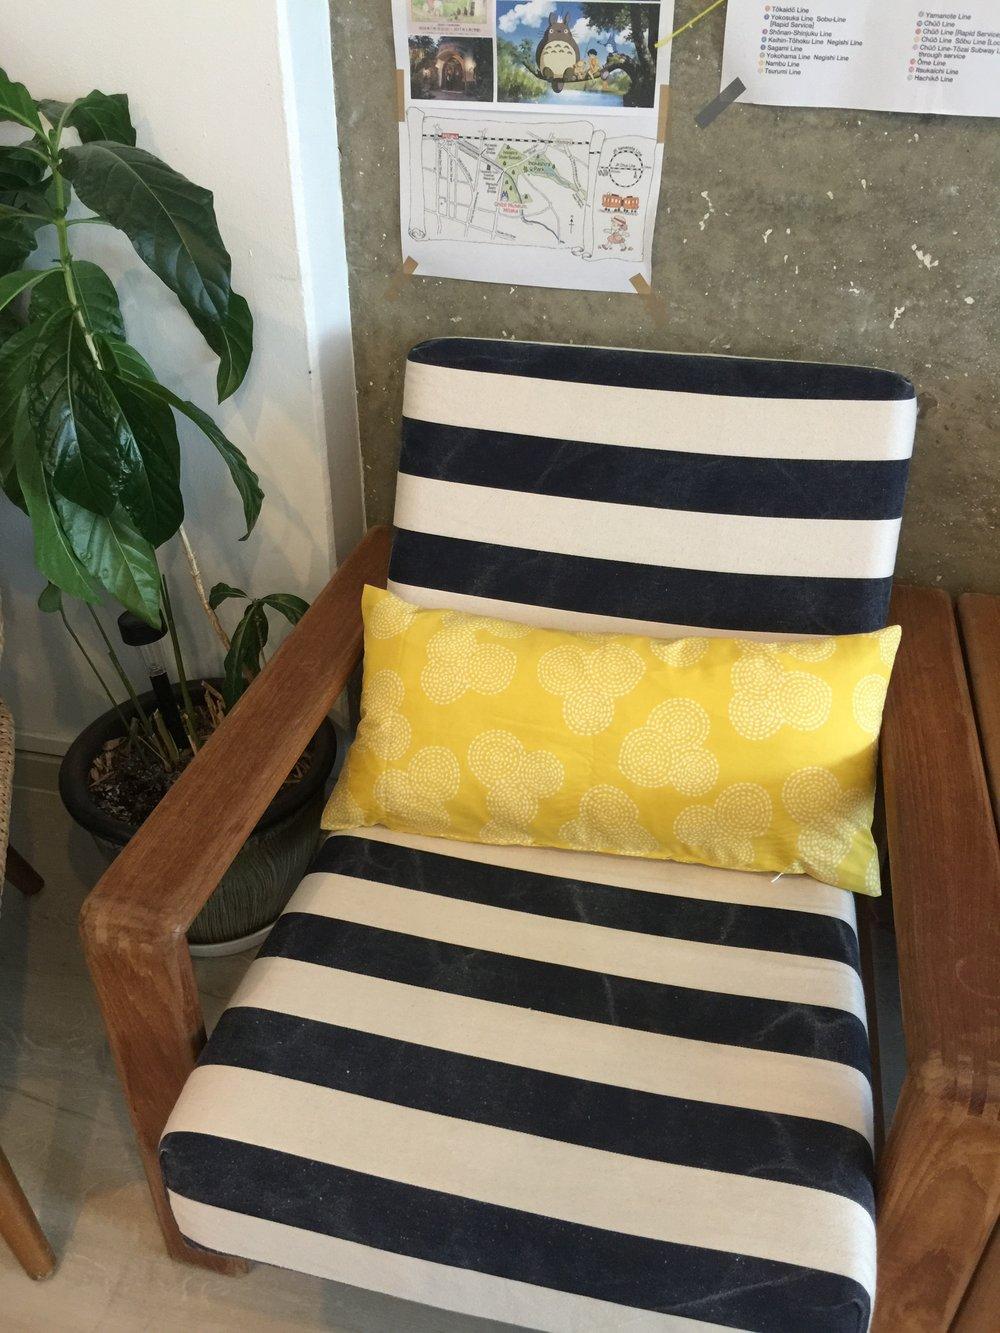 sofa w yellow cushions2.JPG